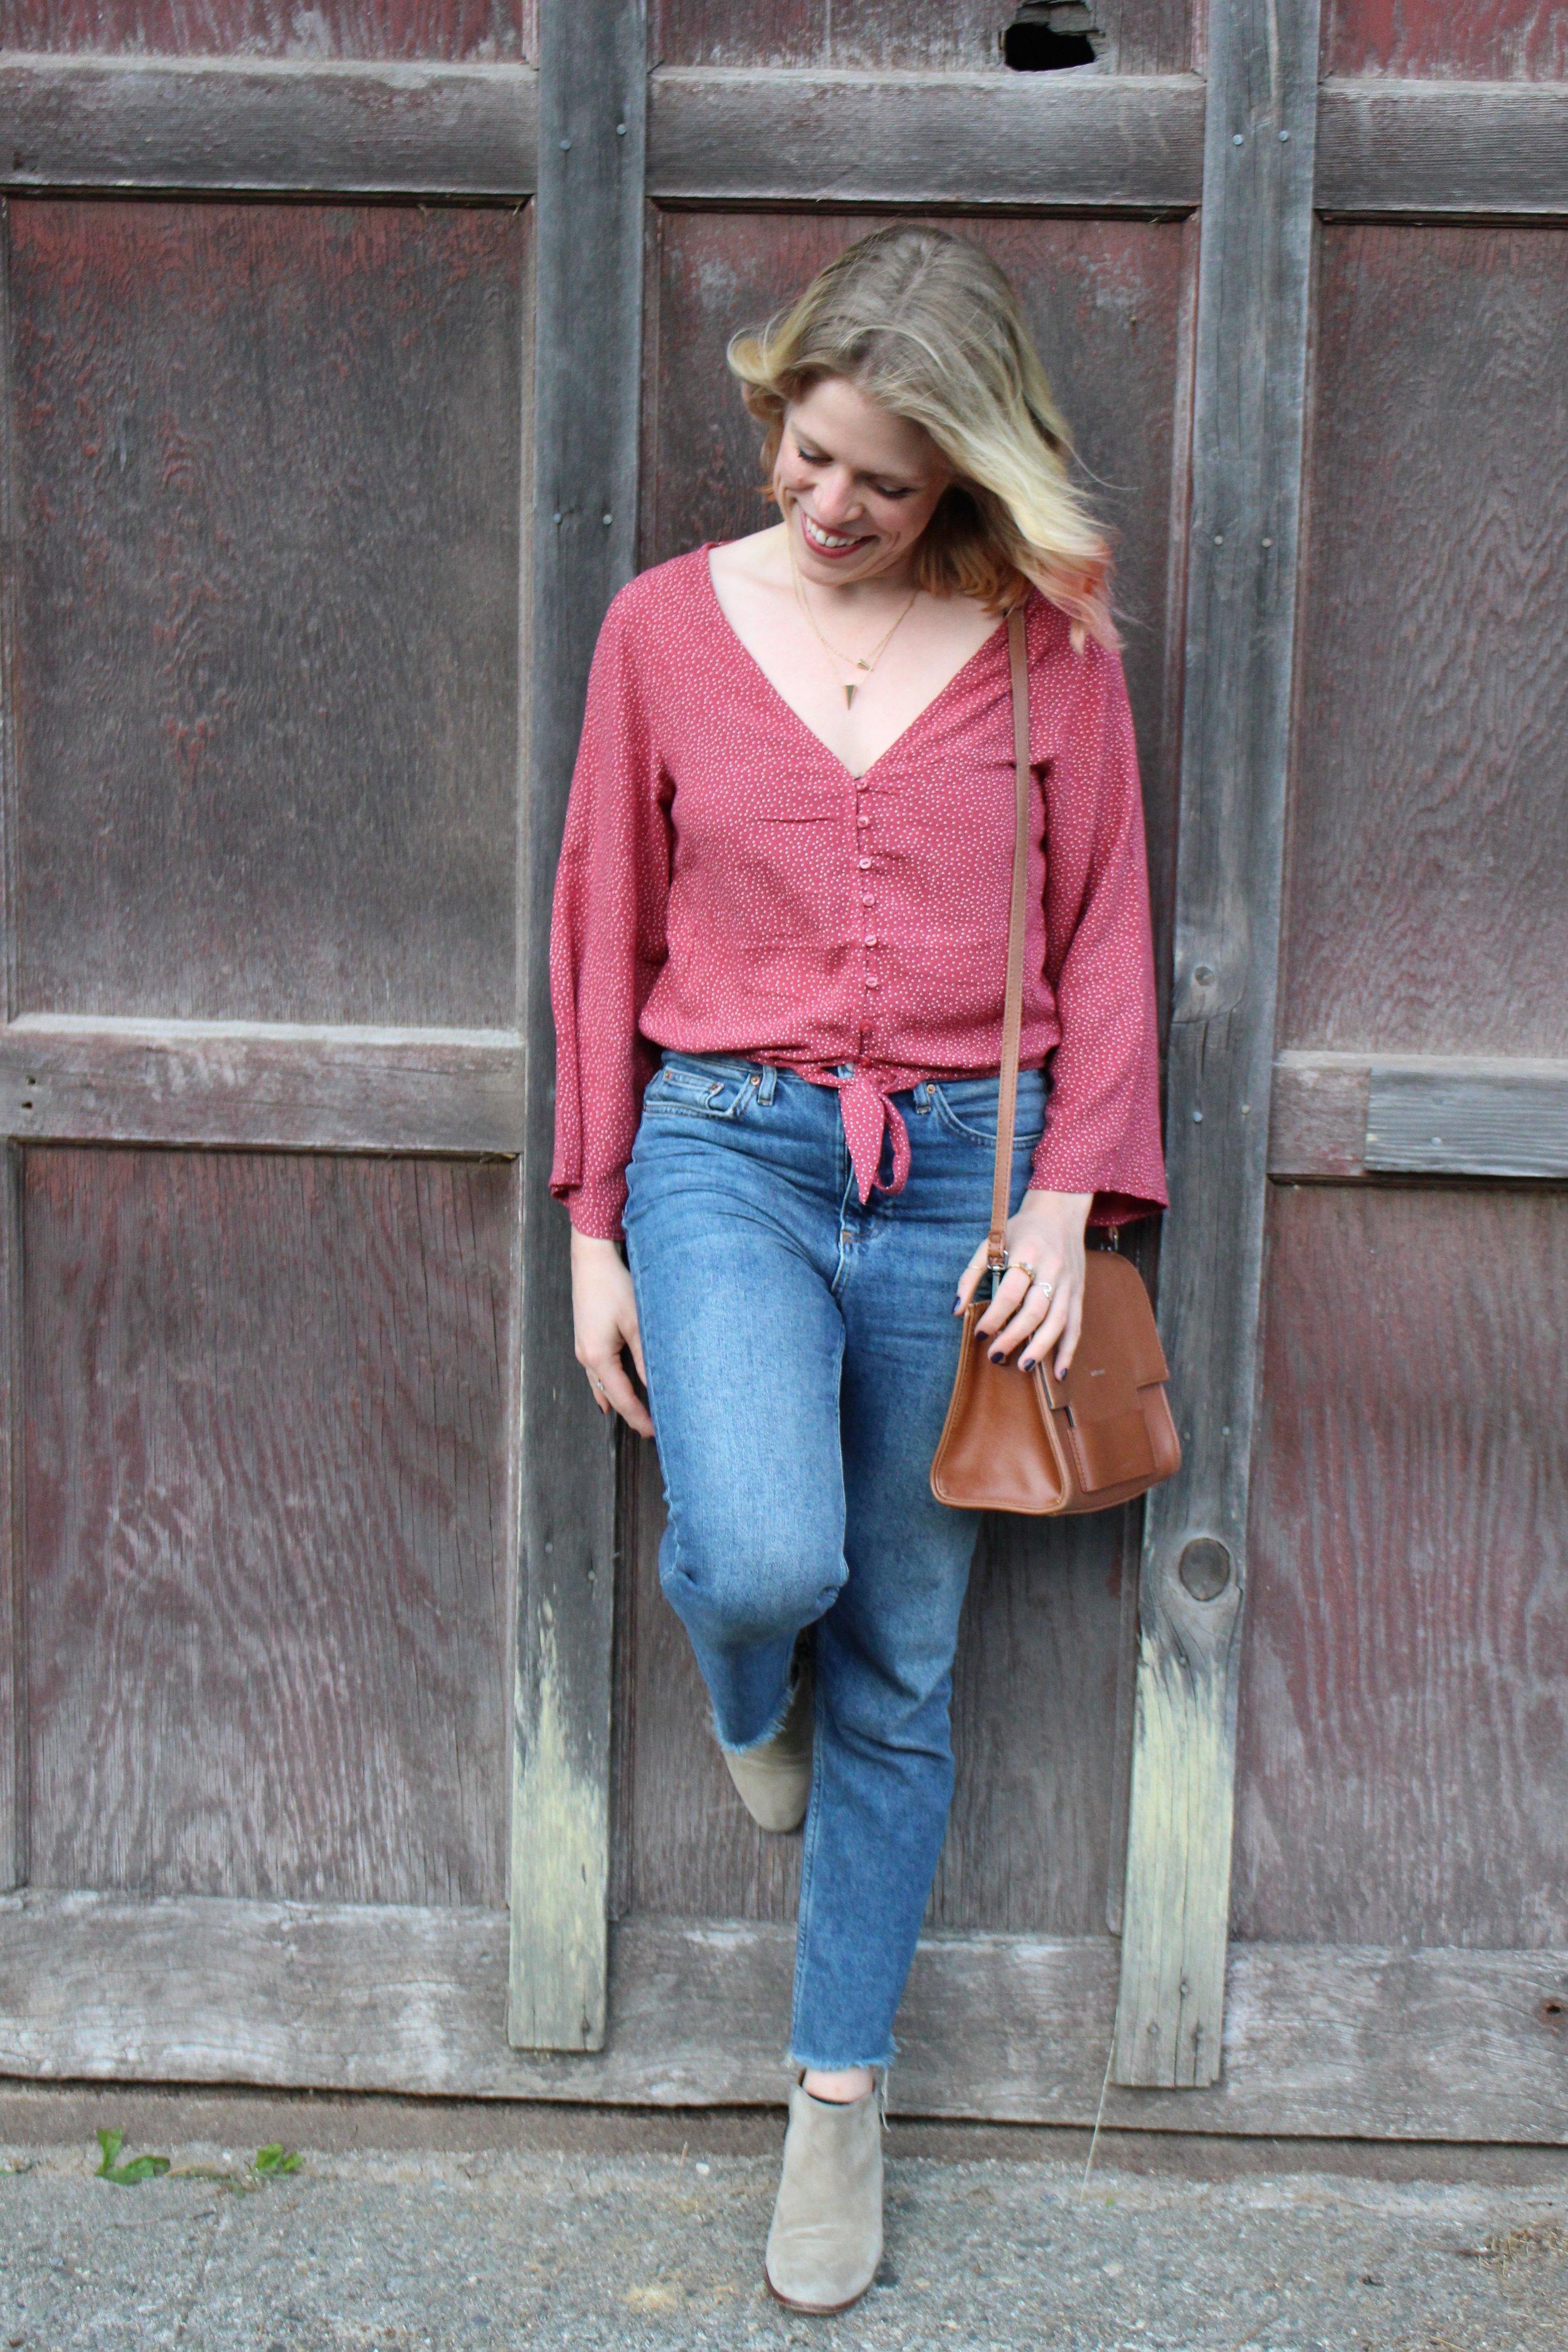 American Eagle   Blouse,   Topshop    Jeans,   Sam Edelman   Booties,   Matt & Nat   Purse,   Kate Spade New York   Necklace